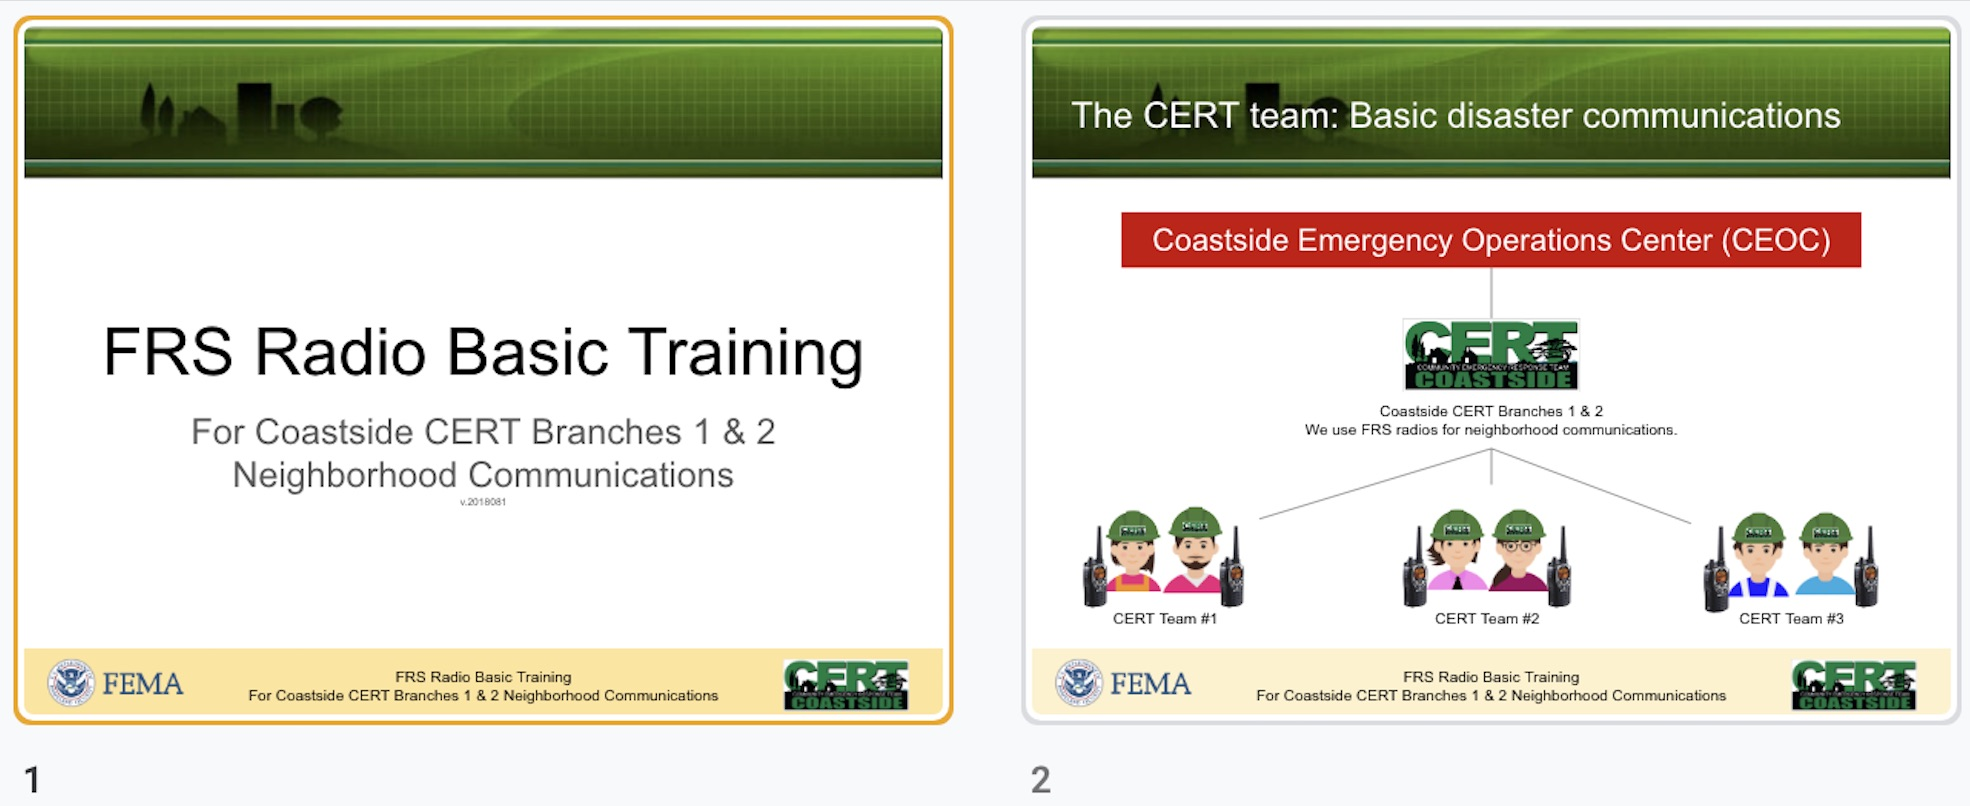 Frs Gmrs Radio Walkietalkies Basic Training Learn How To